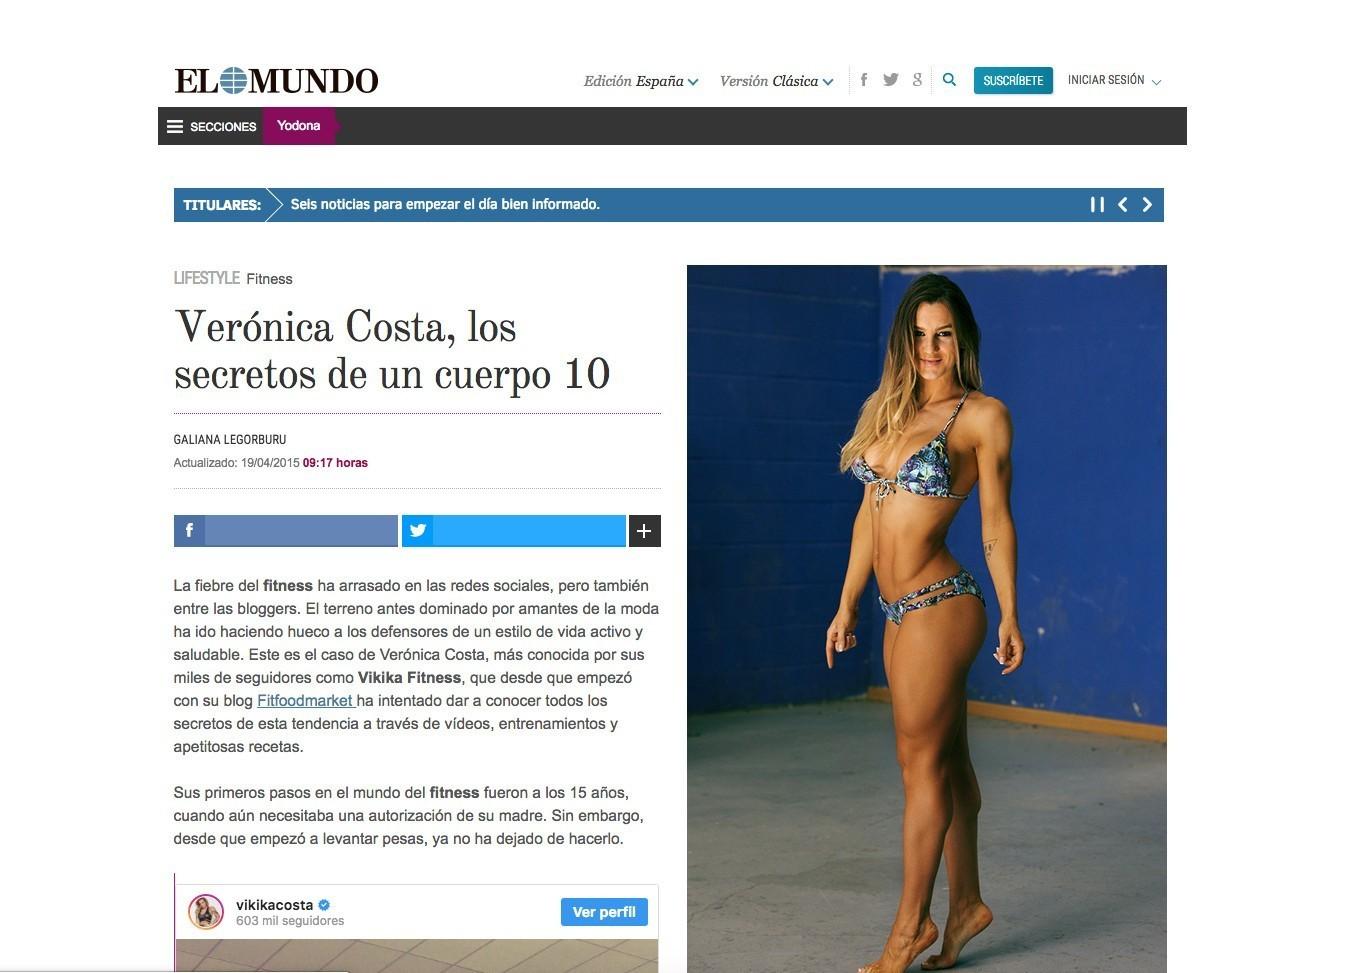 El Mundo Yodona Lifestyle 19 04 15